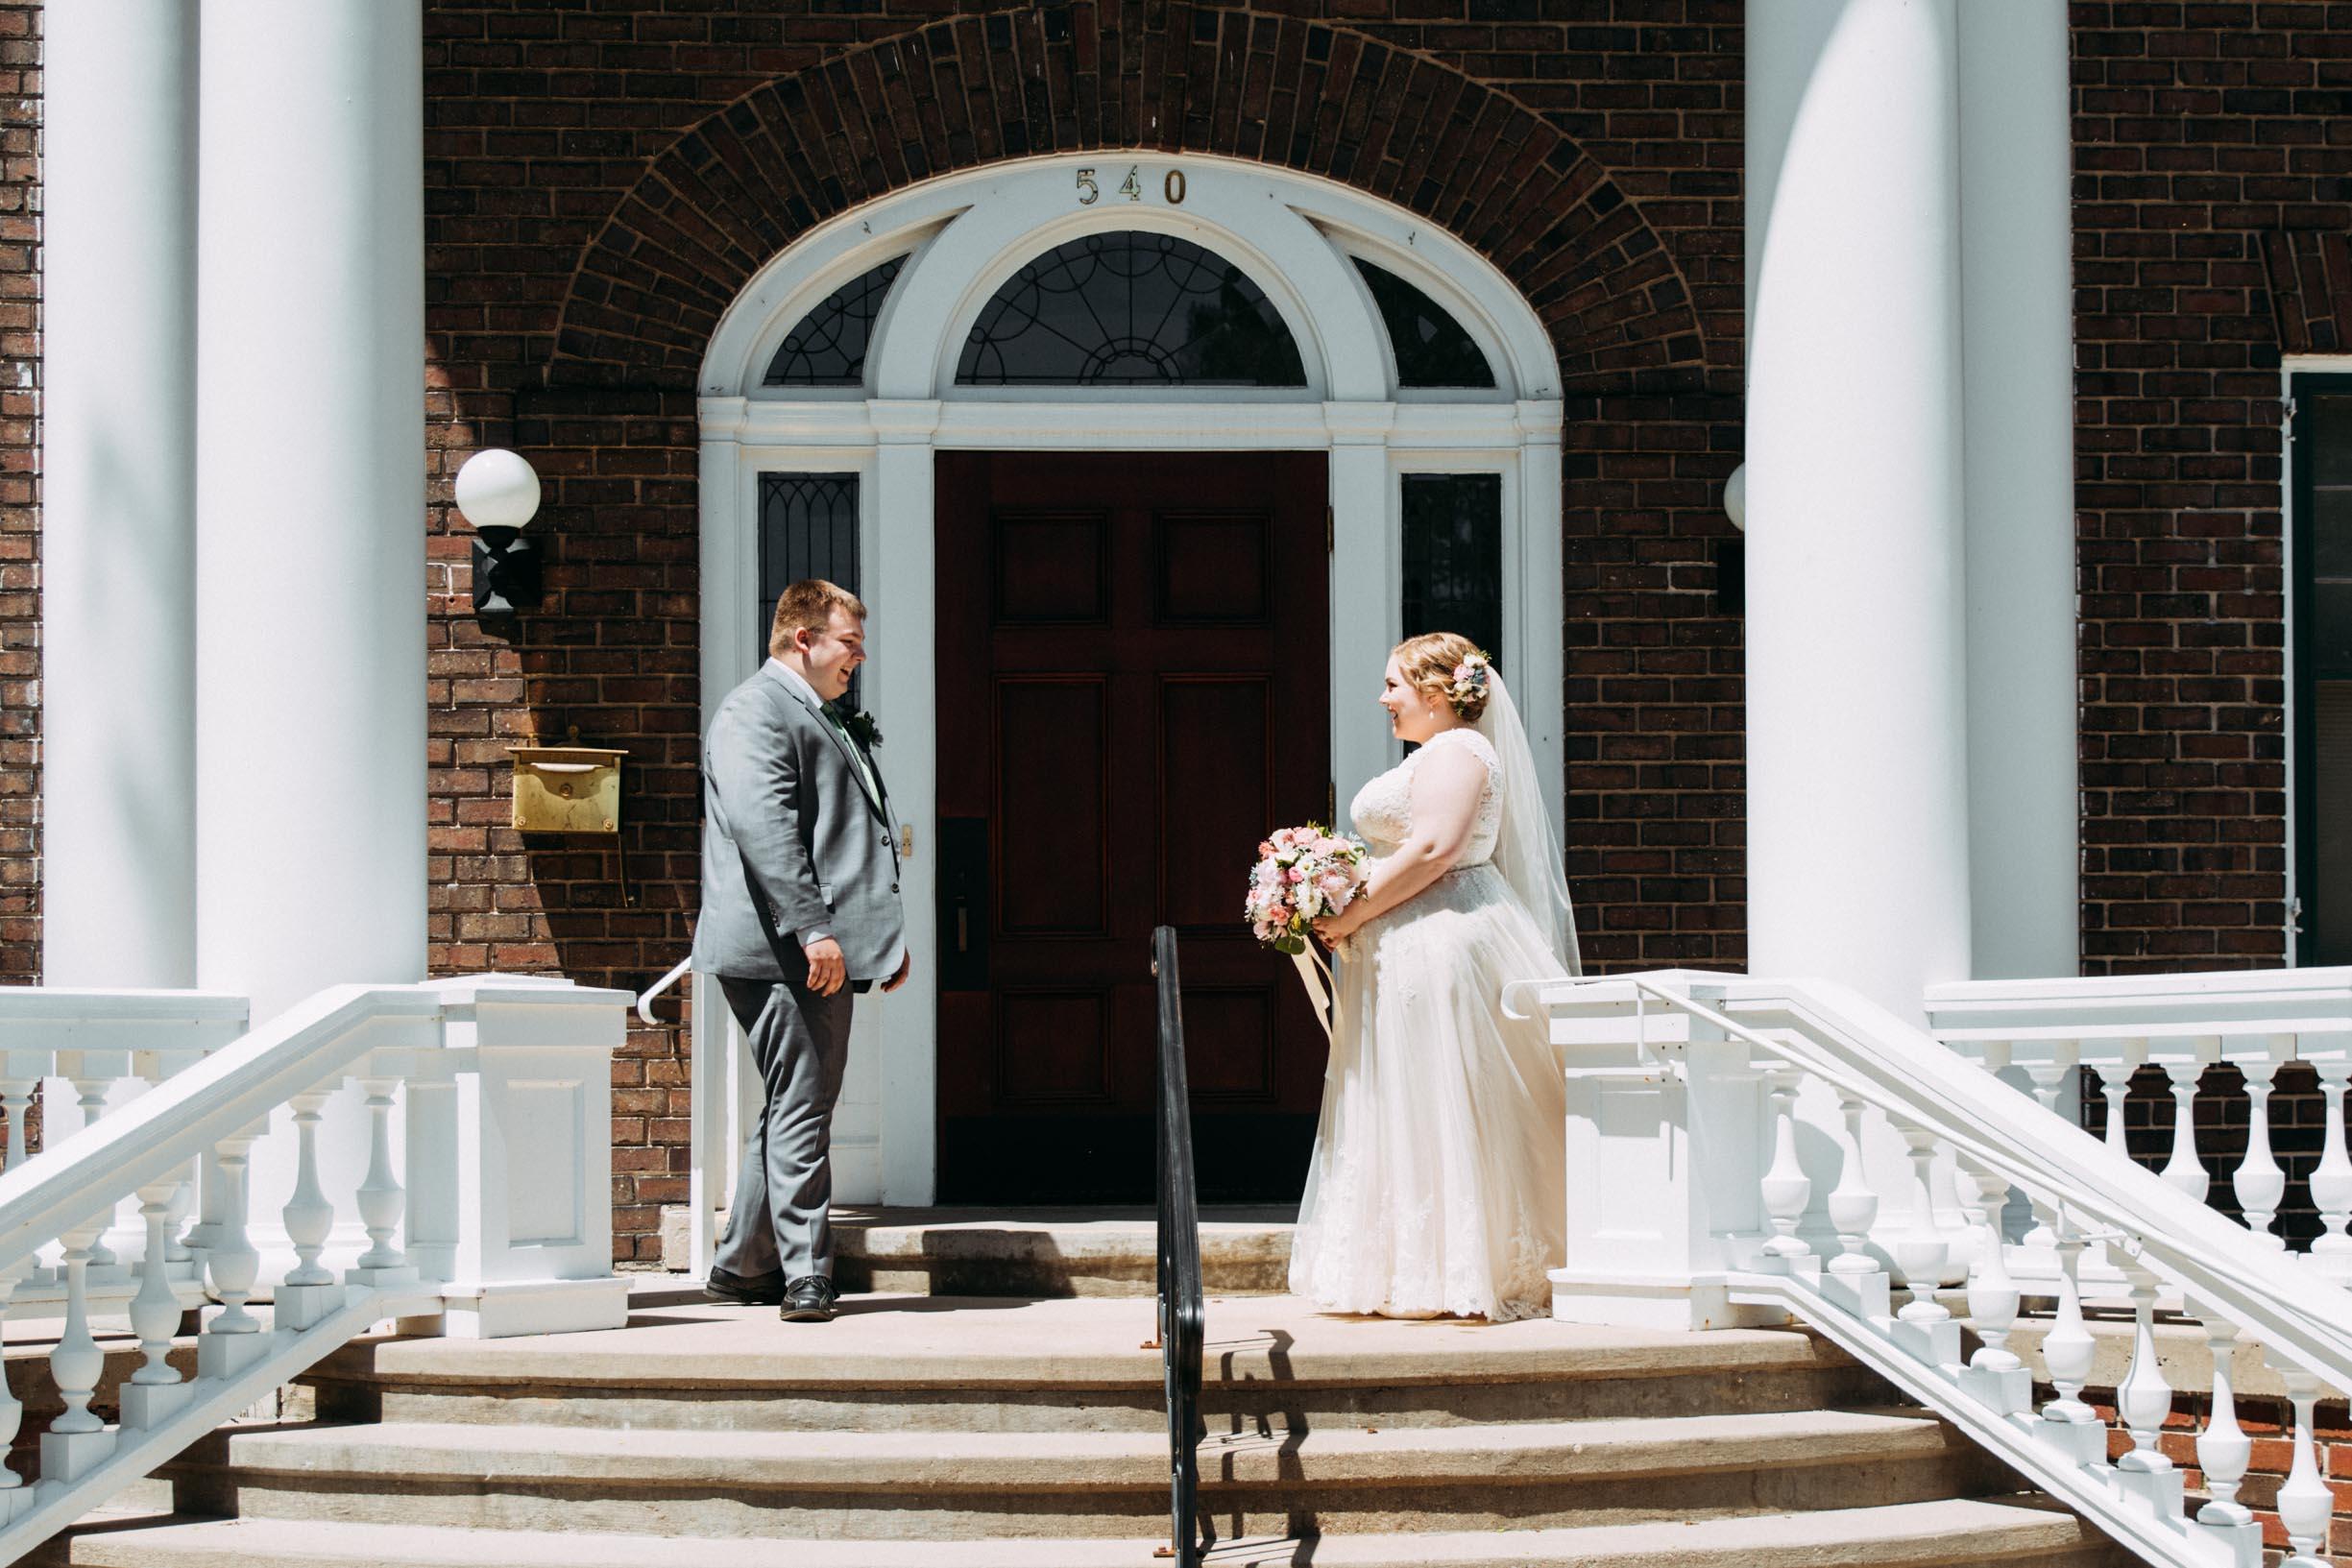 Hannah_Brandon_Wisconsin_Wedding_First_Look-11.jpg